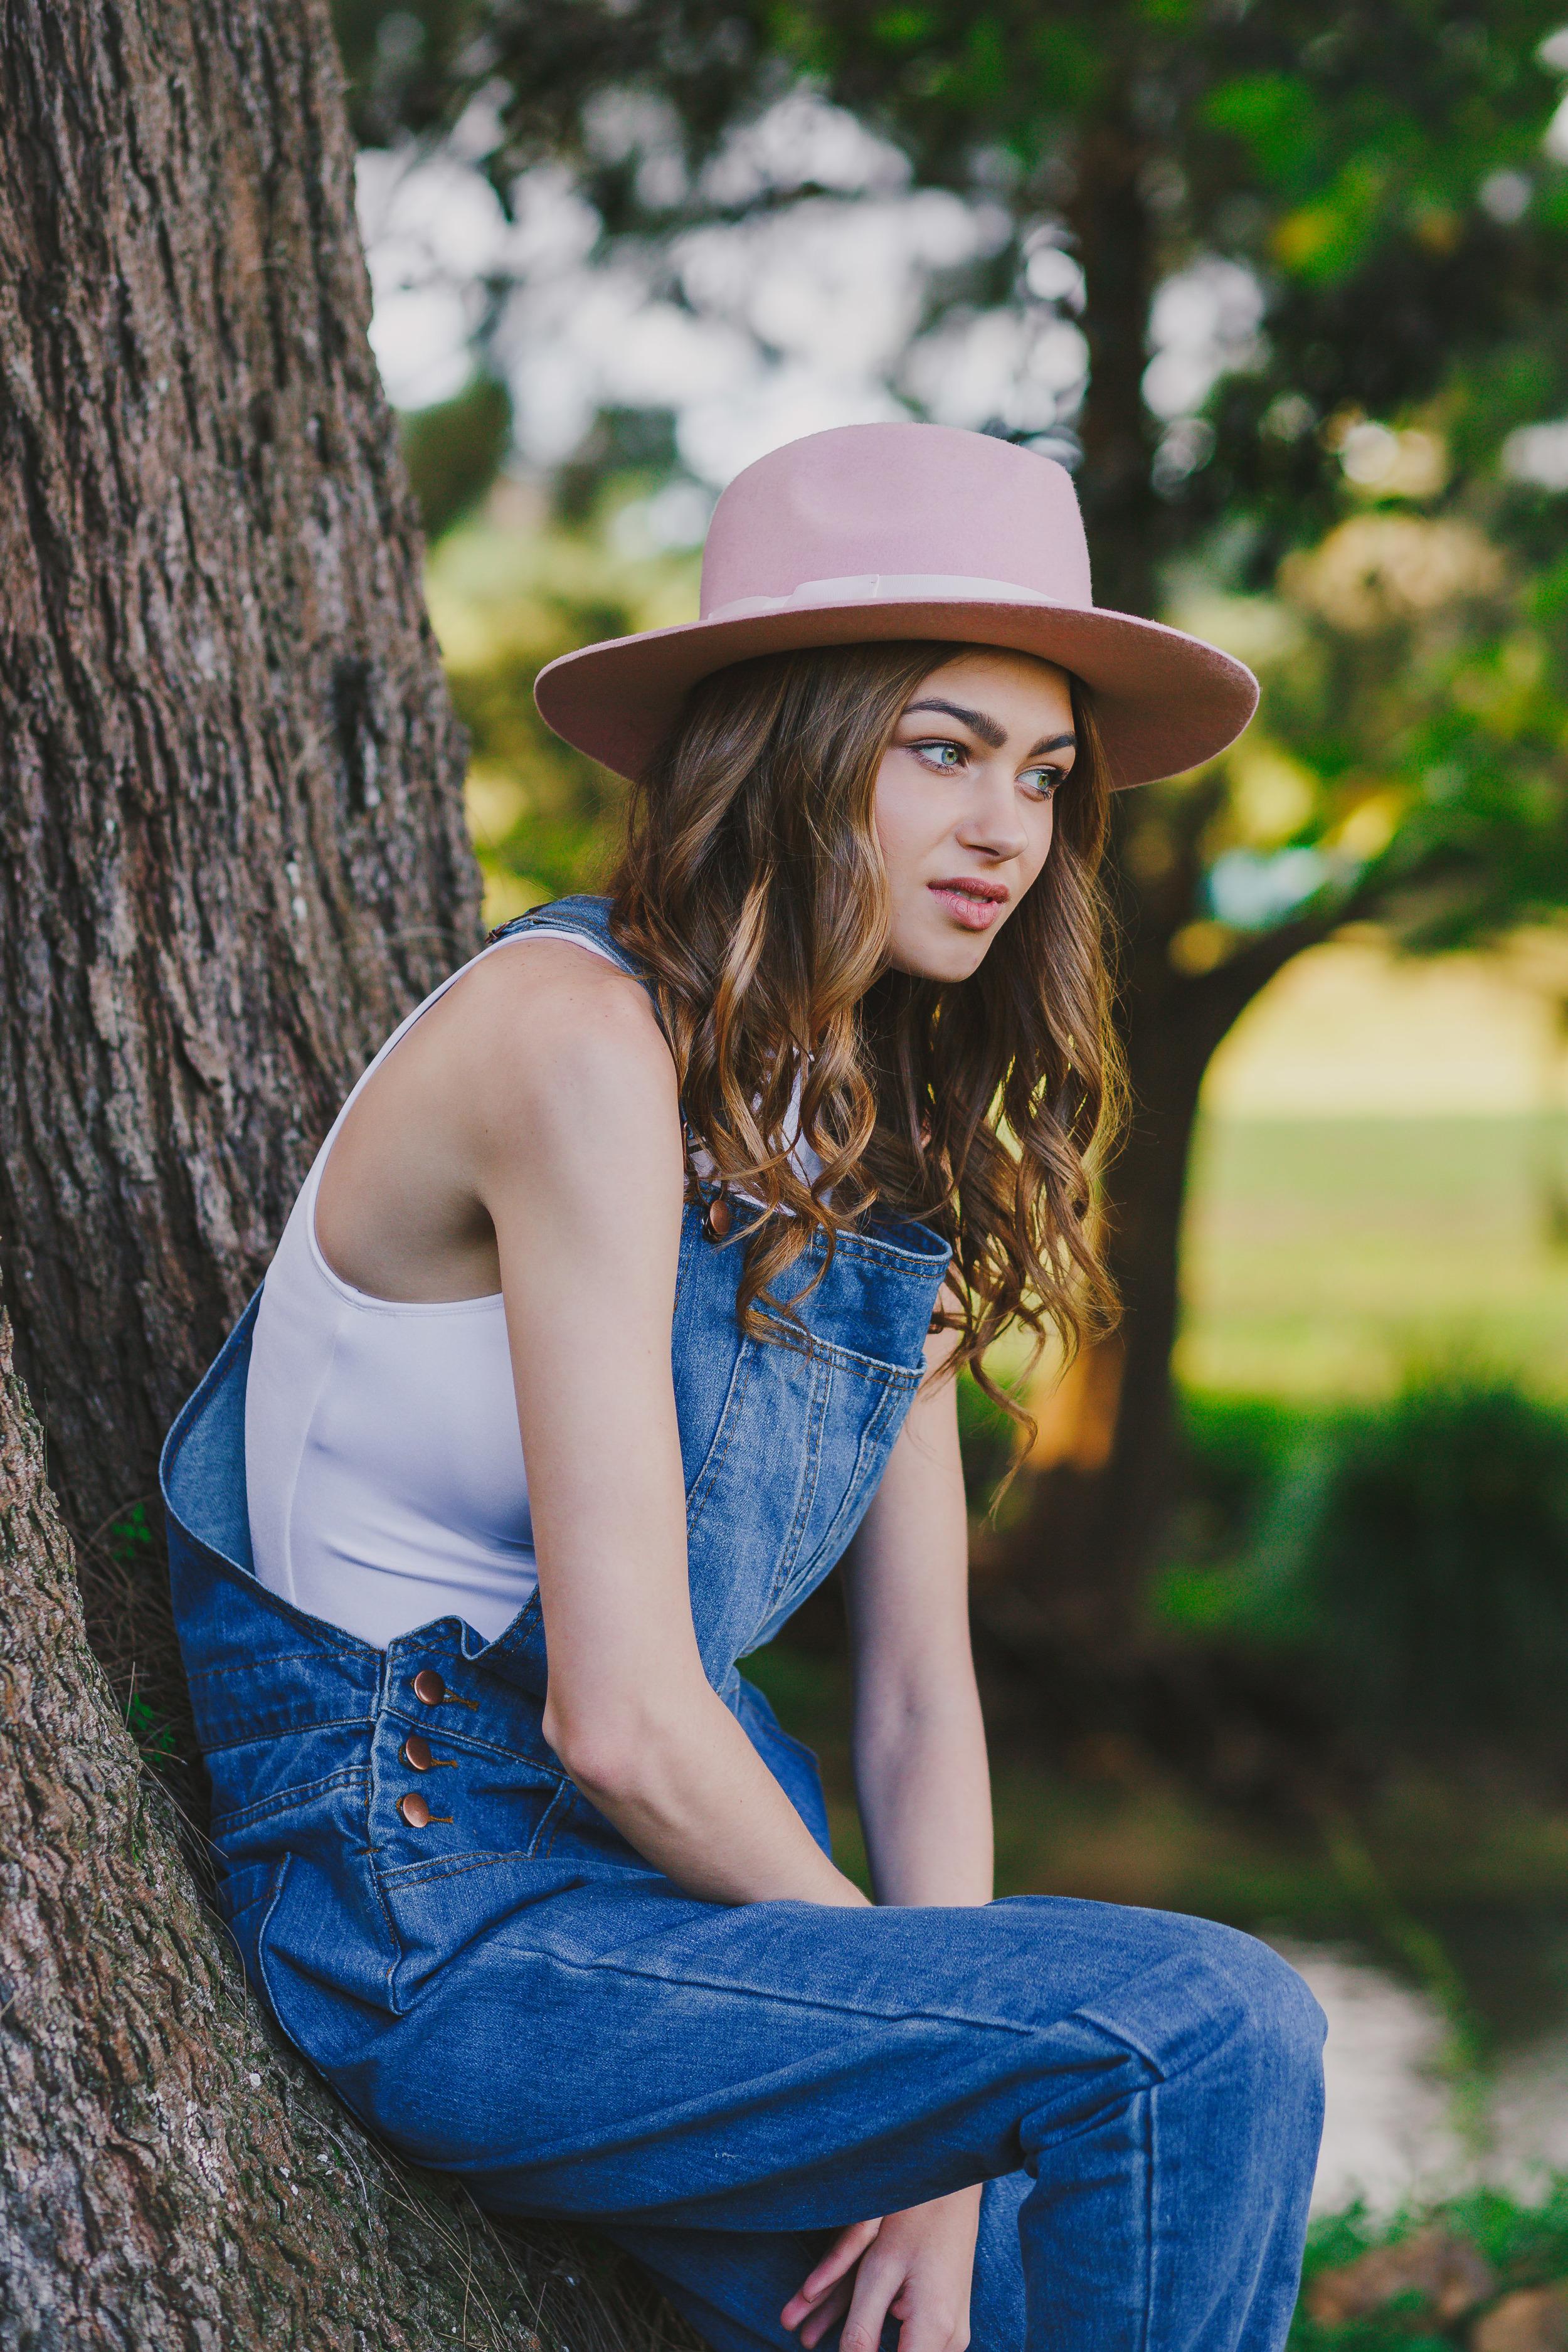 Brooke_Alana Taylor Photography-17.jpg